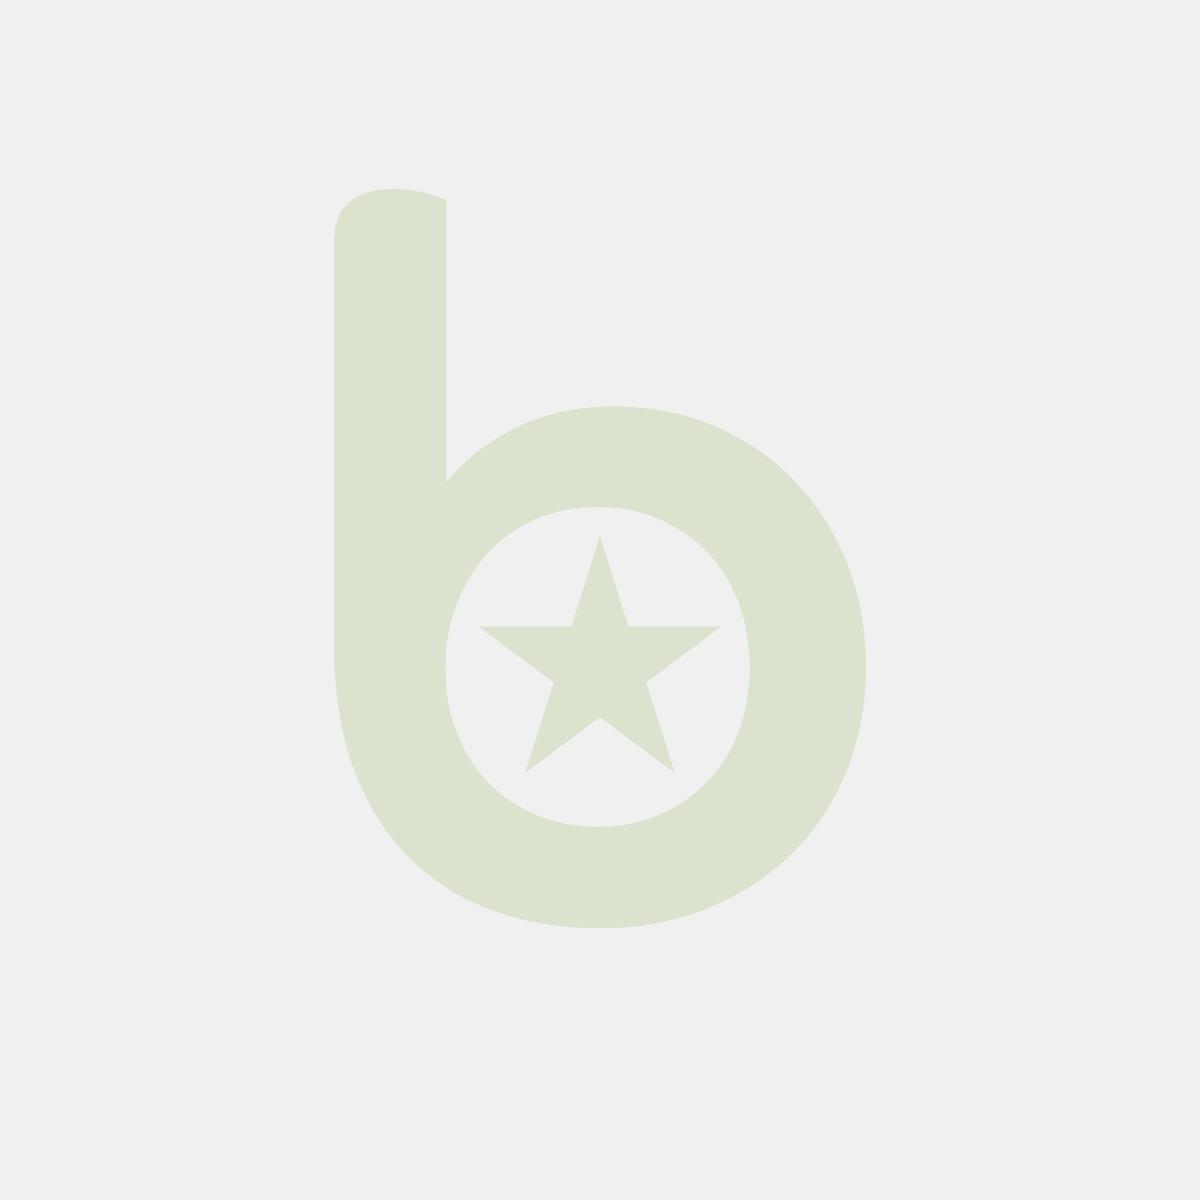 FINGERFOOD - pucharek PS czarny 95ml op. 25 sztuk